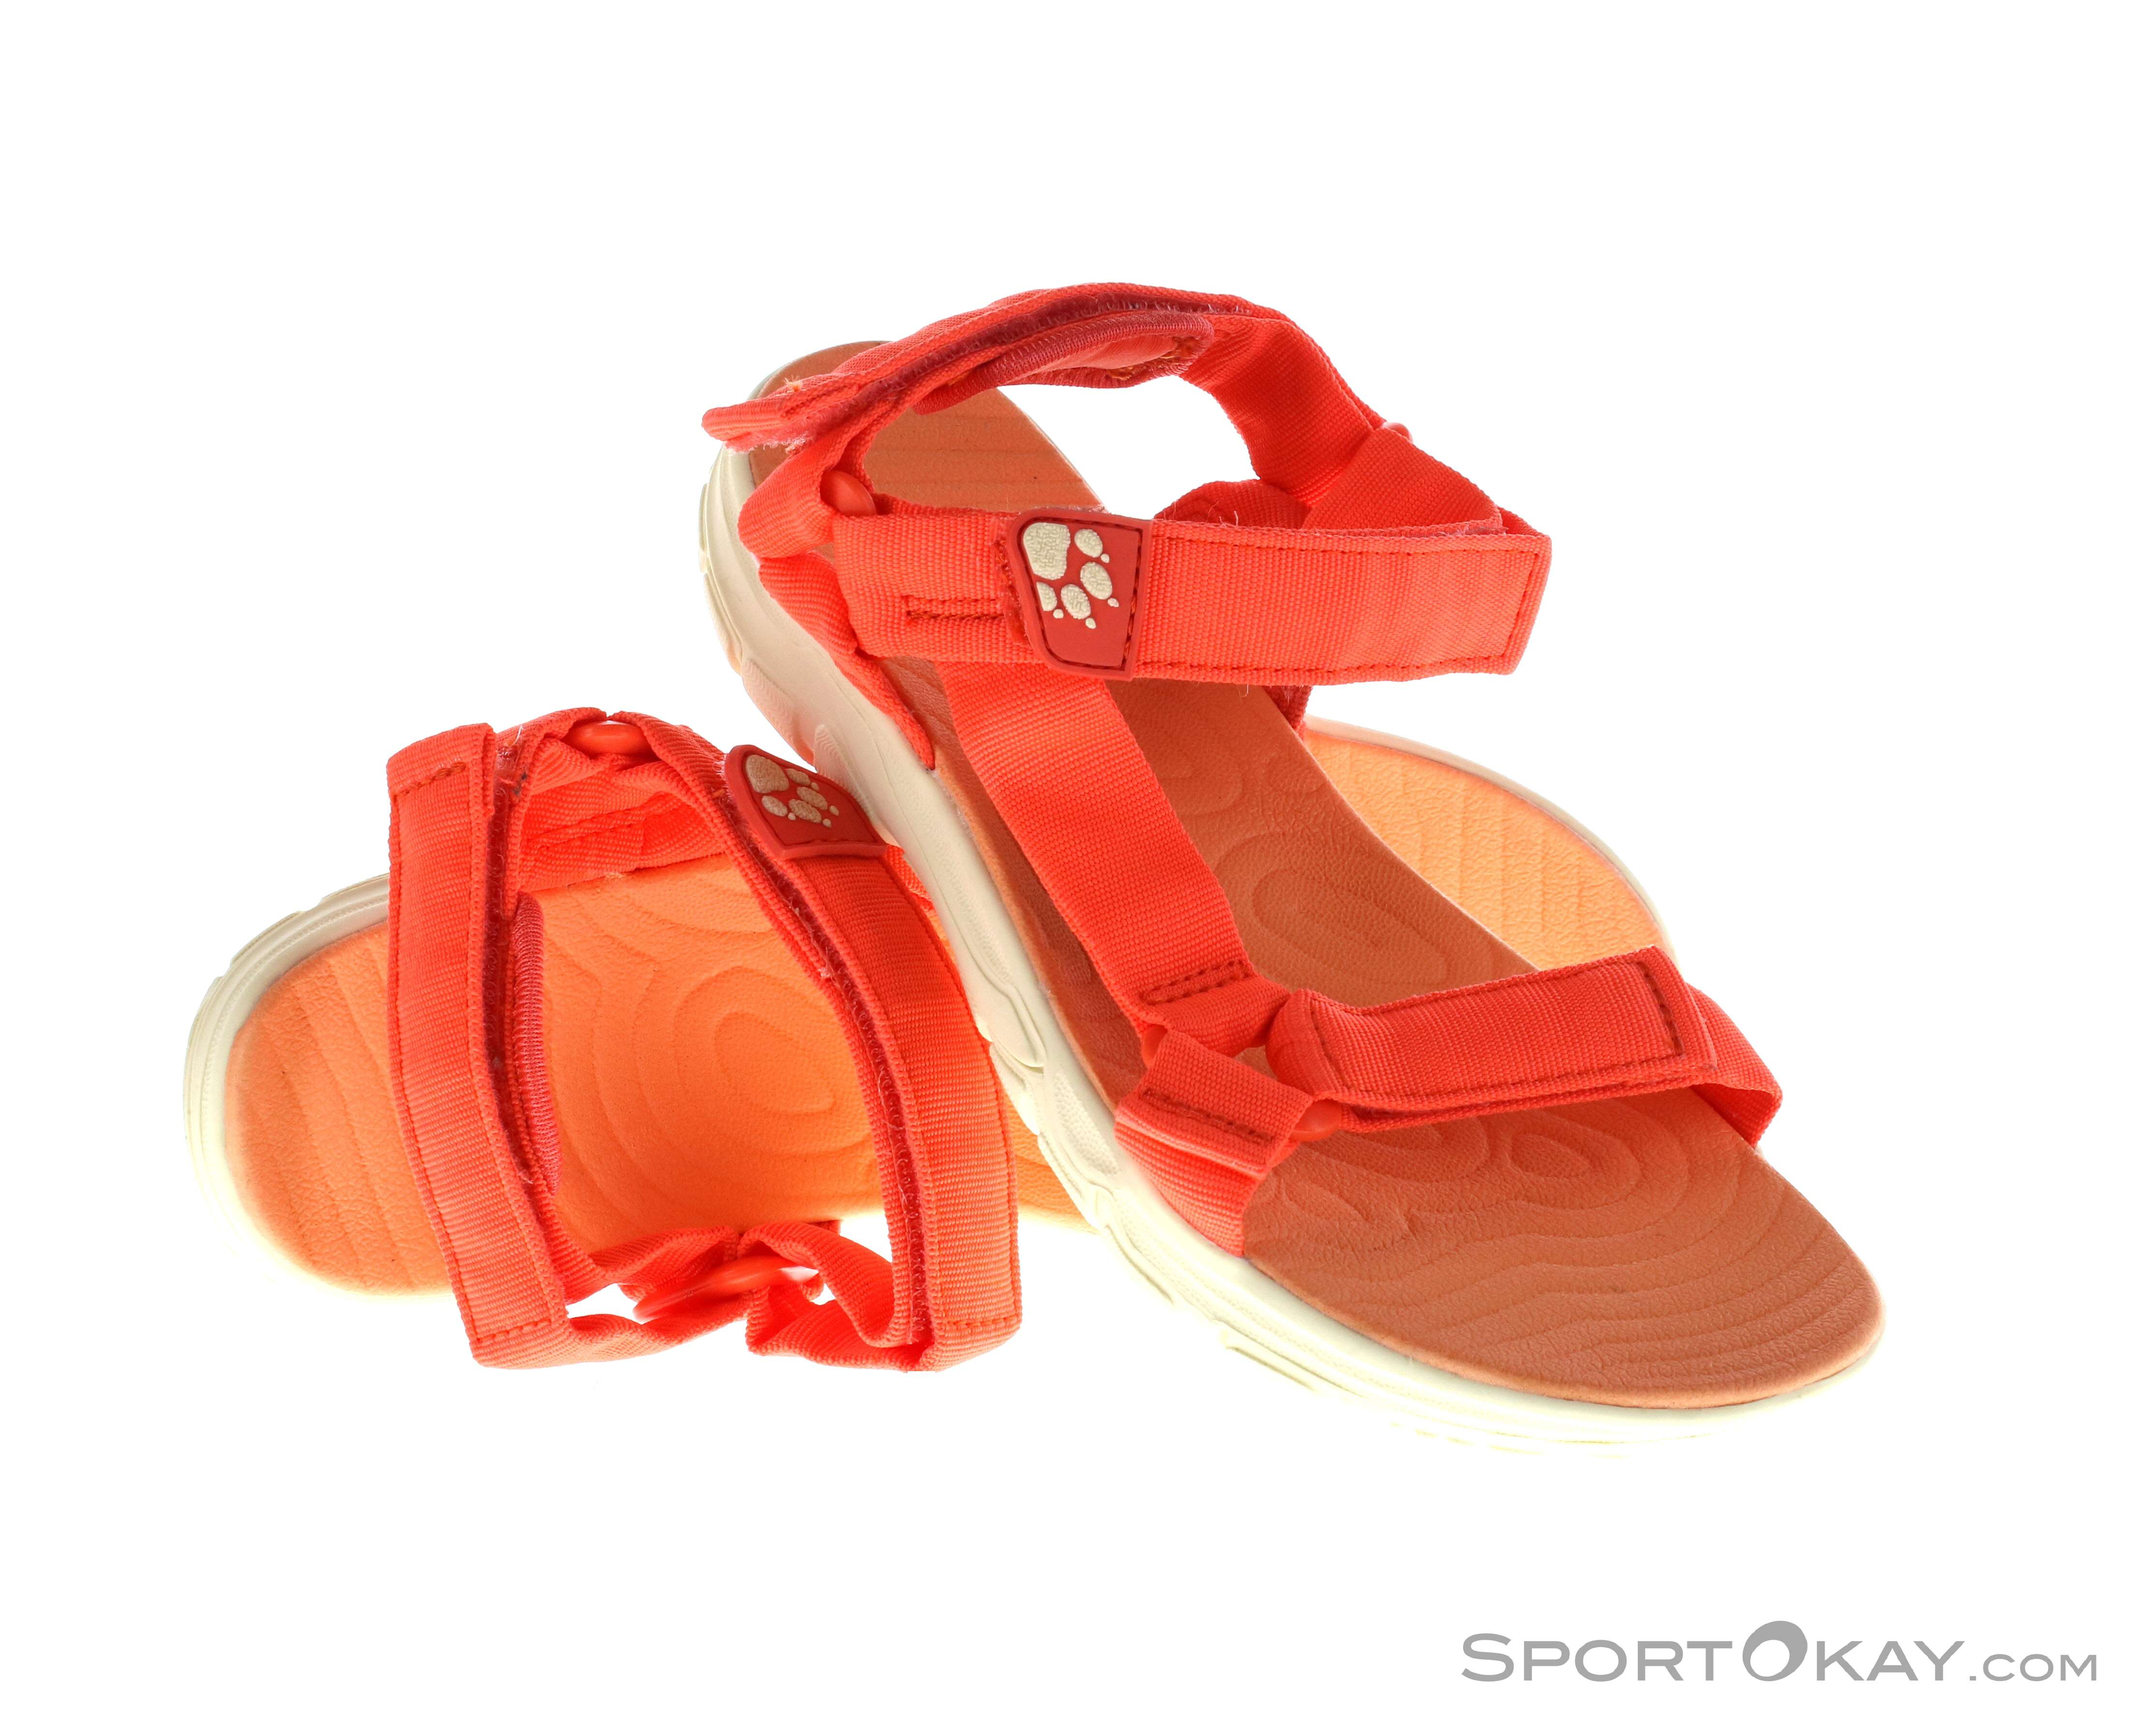 Jack Wolfskin Jack Wolfskin Seven Seas Womens Leisure Sandals